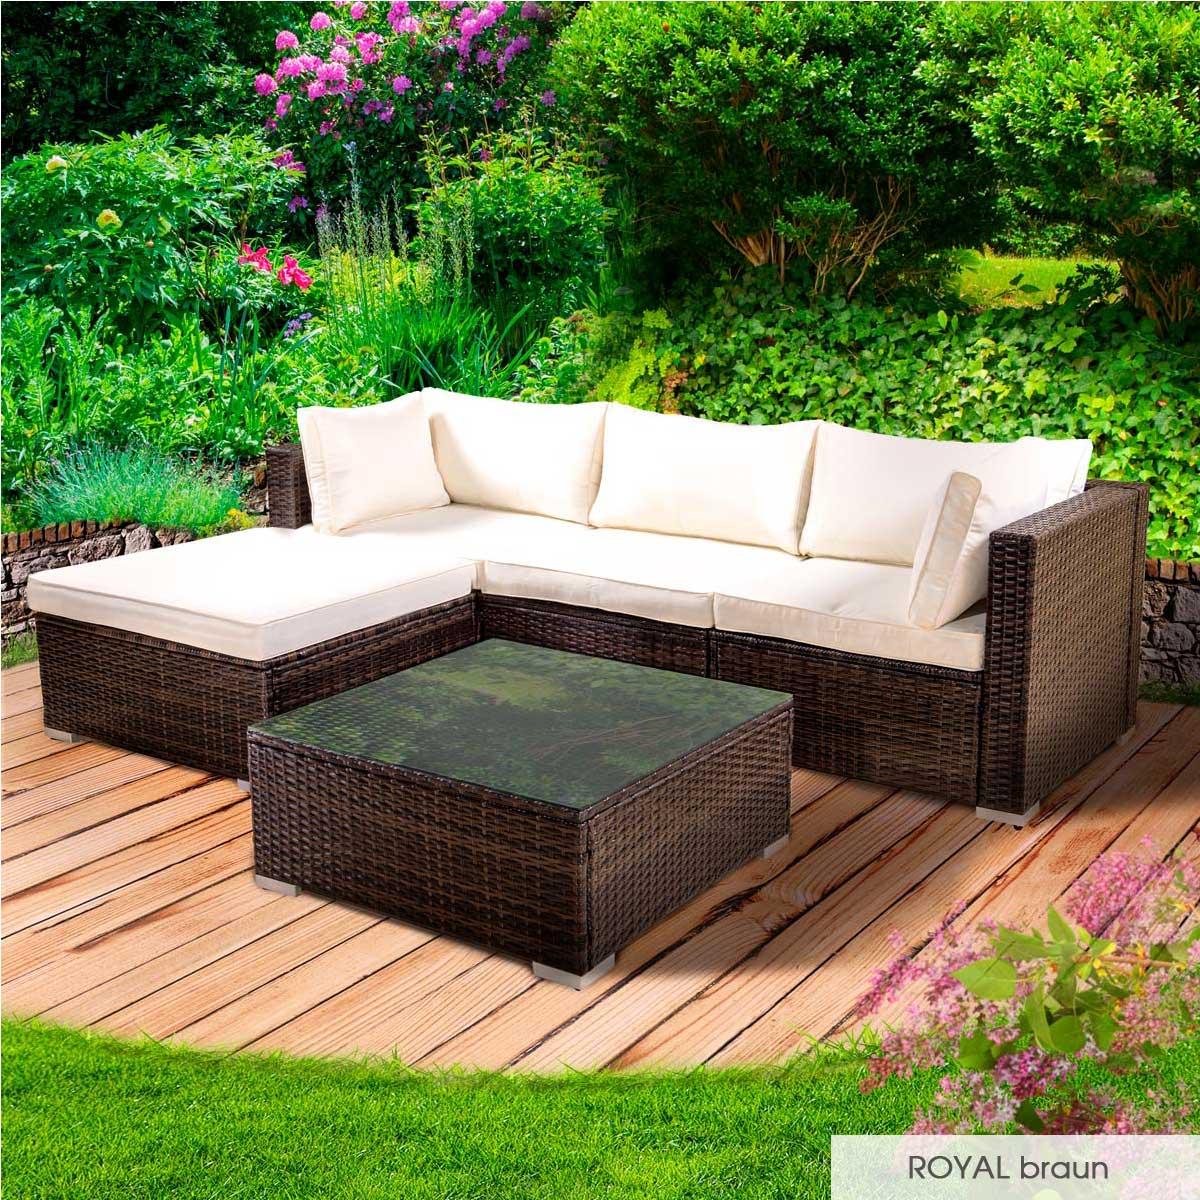 Gartenmoebel-Poly-Rattan-Lounge-Moebel-Sitzgarnitur-Gartengarnitur-Sitzgruppe-Sofa Indexbild 14